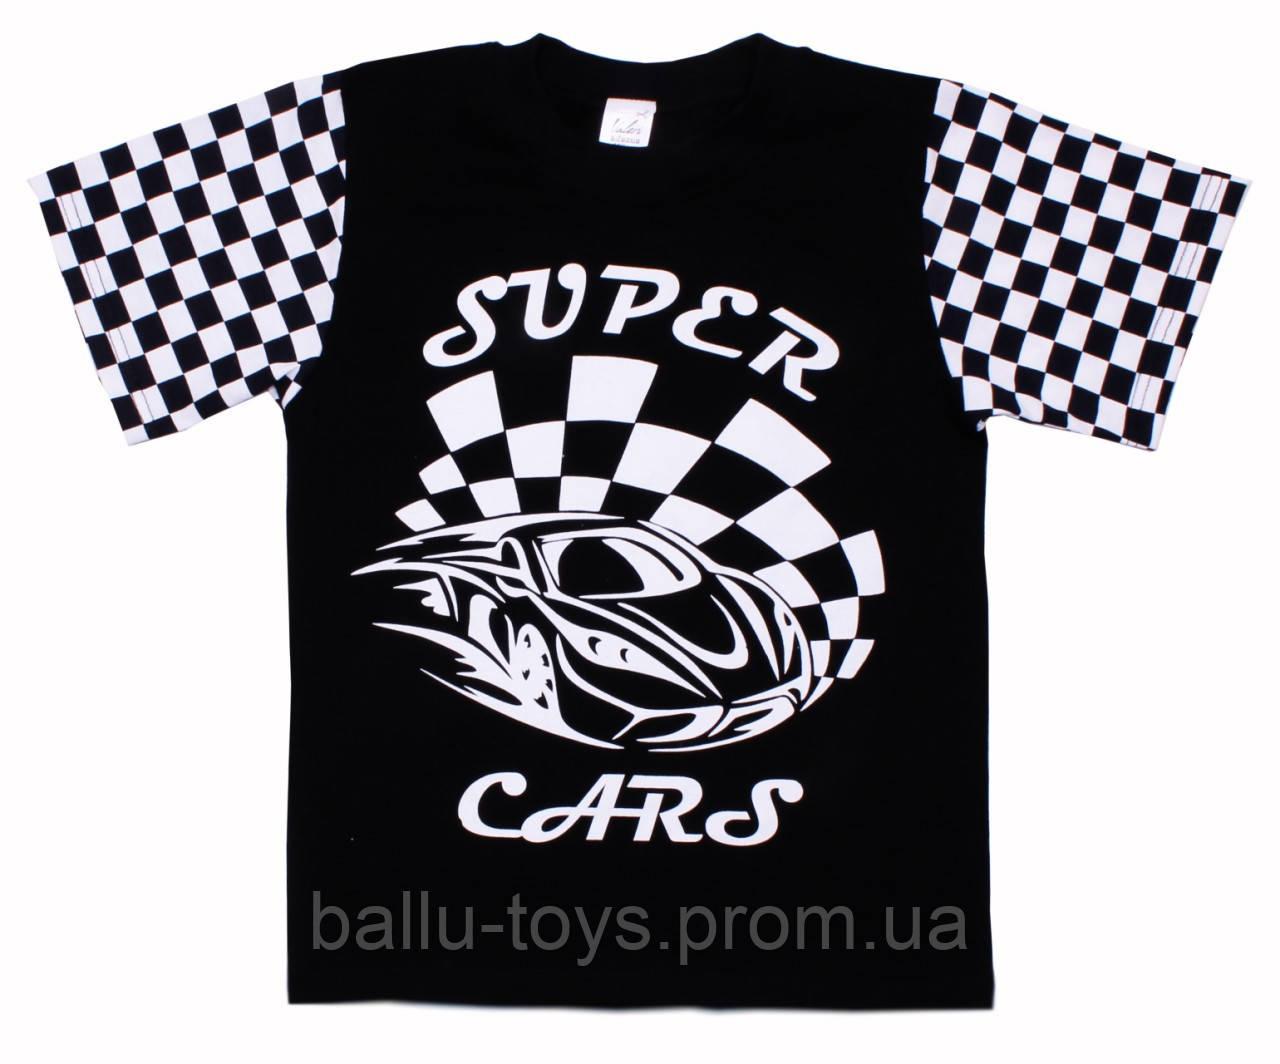 Летняя футболка на мальчика Super Cars (7-12 лет)